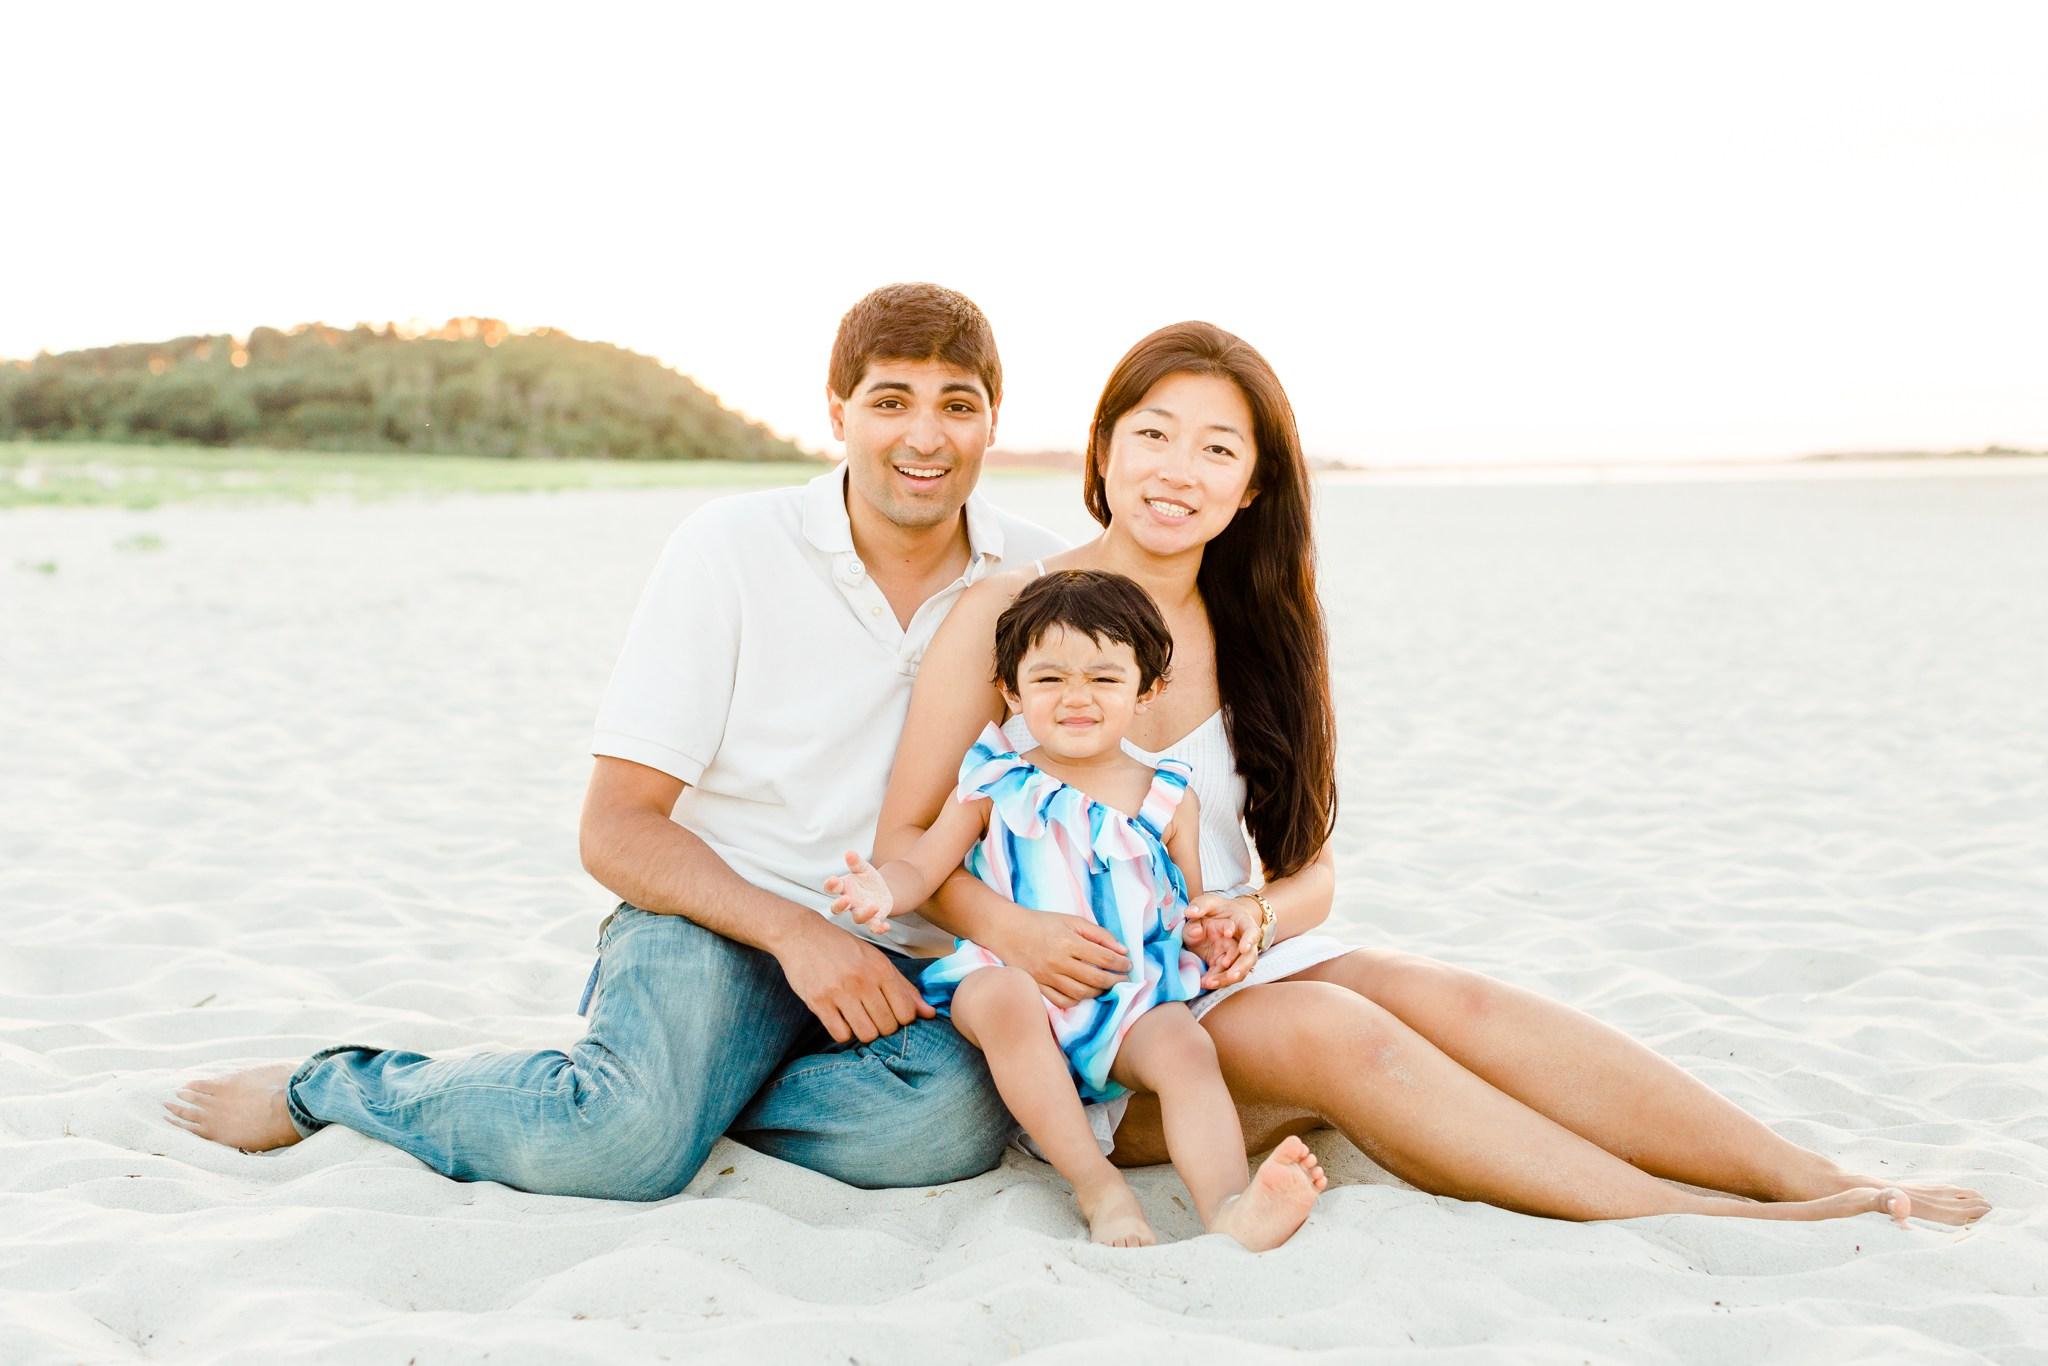 crane_beach_family_portraits_deborah_zoe_00004.JPG